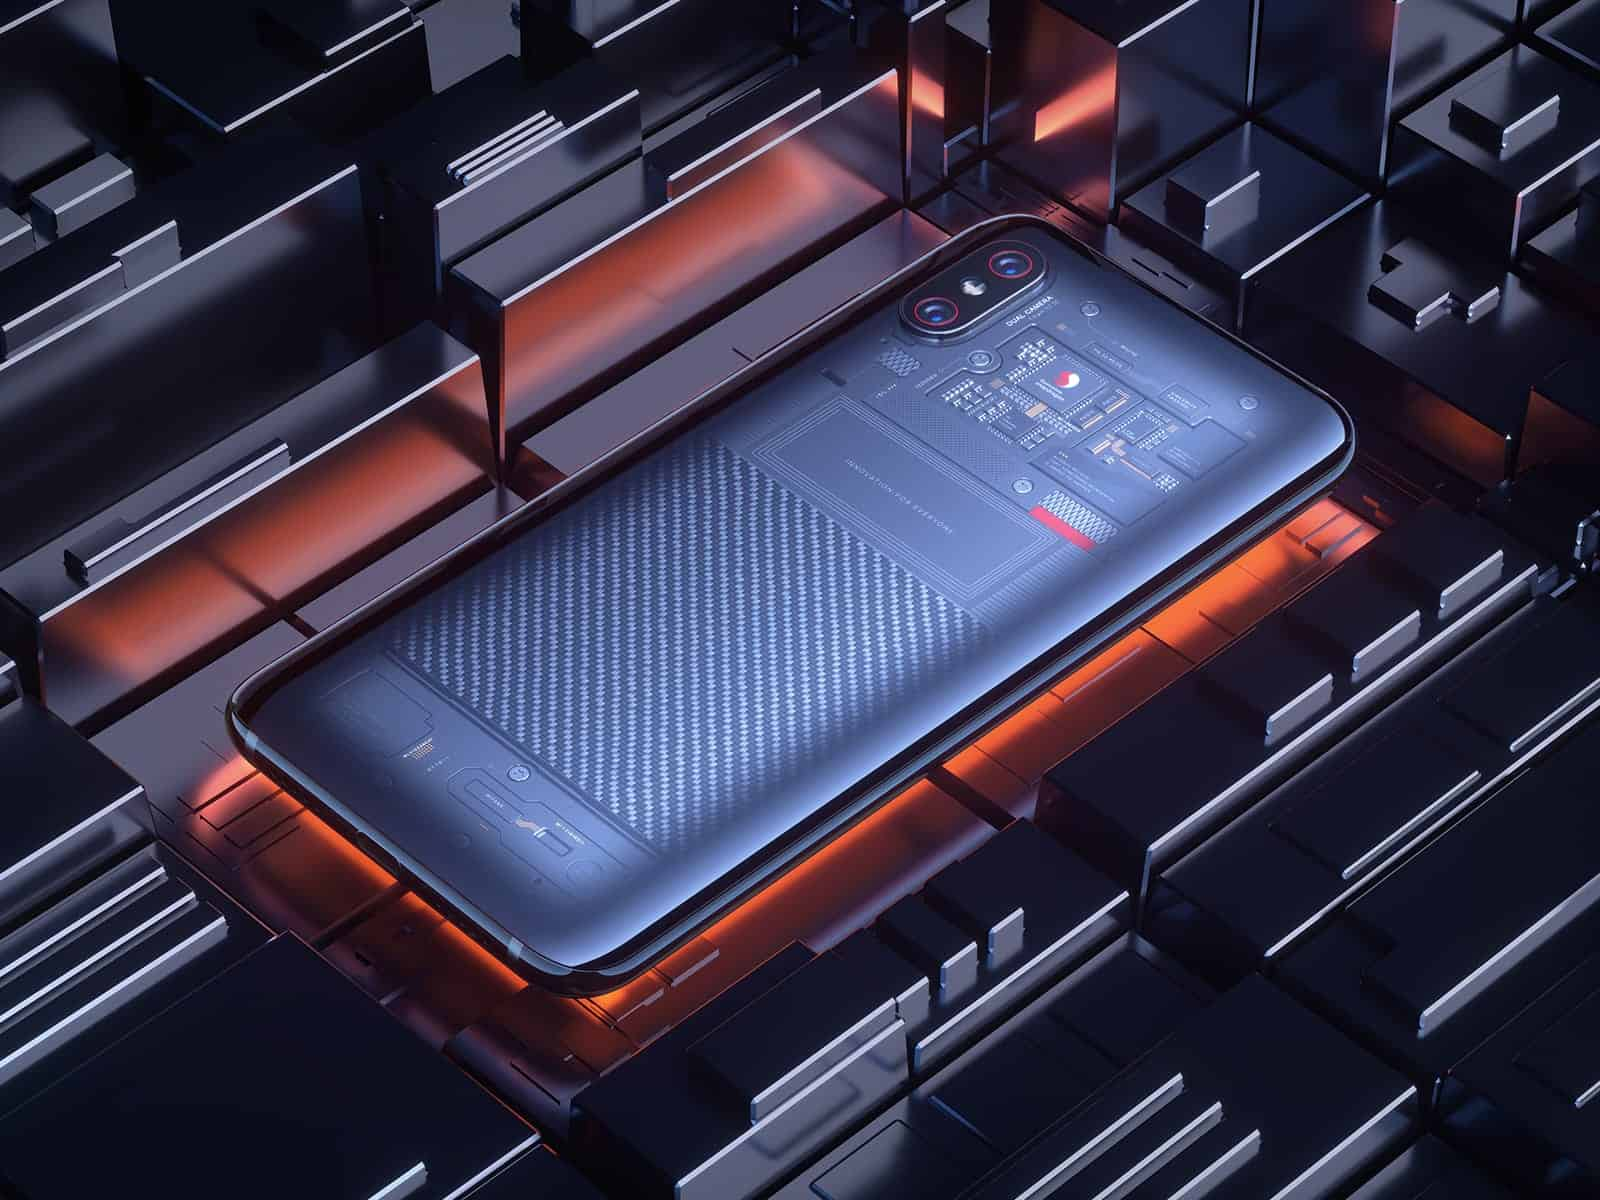 Xiaomi Mi 8 Explorer Edition official image 5